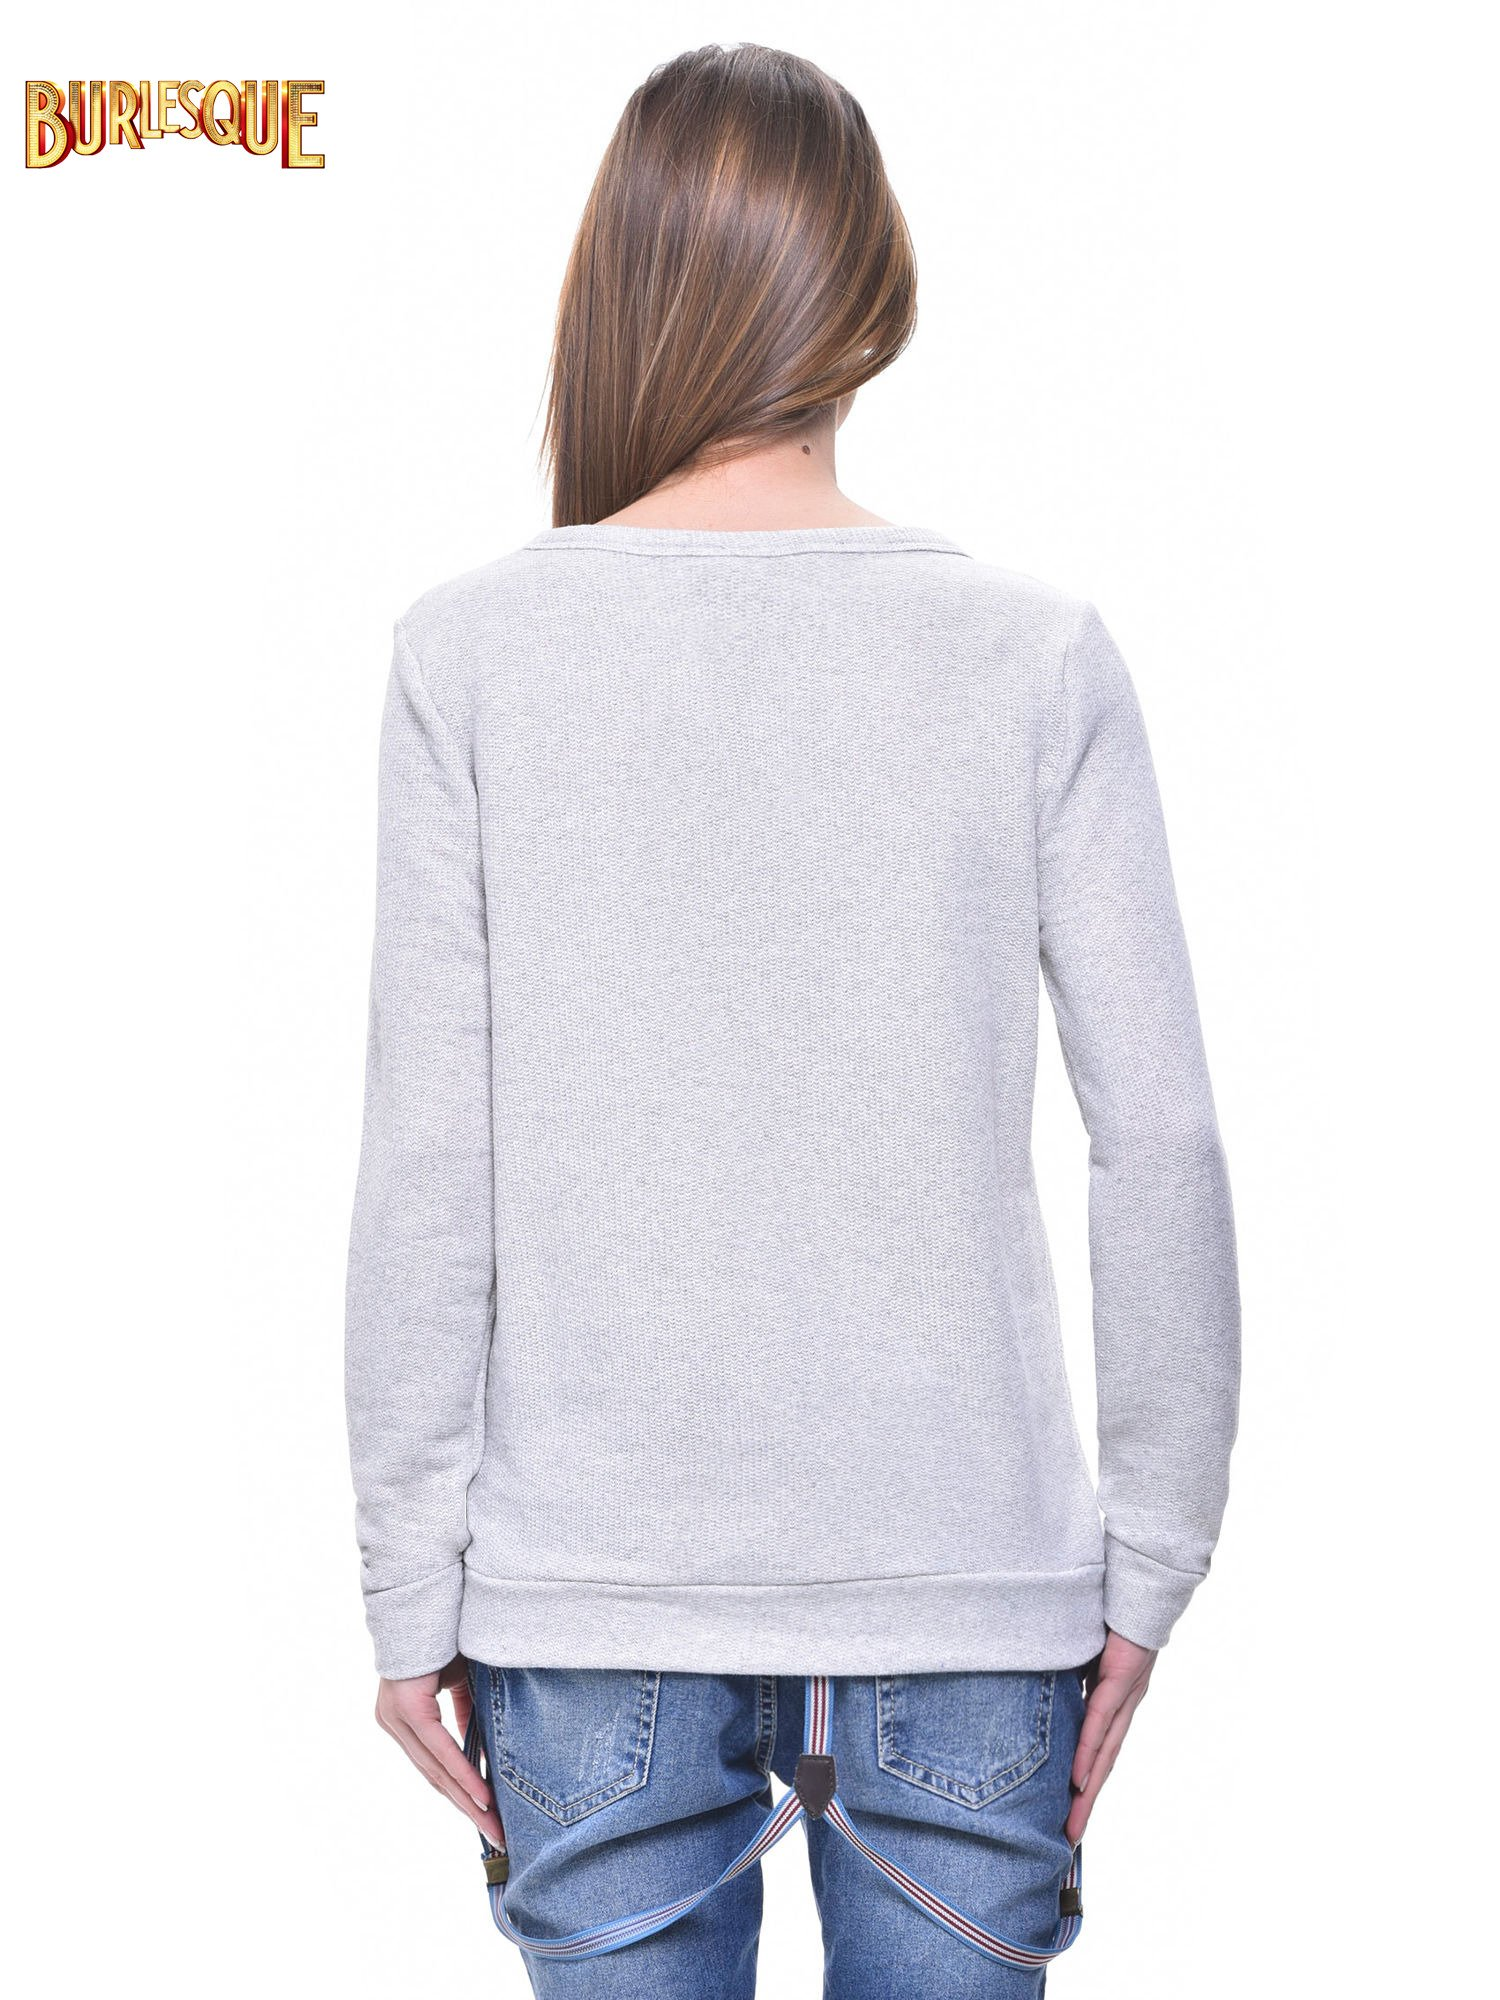 Jasnoszara bluza damska z sówkami                                  zdj.                                  4